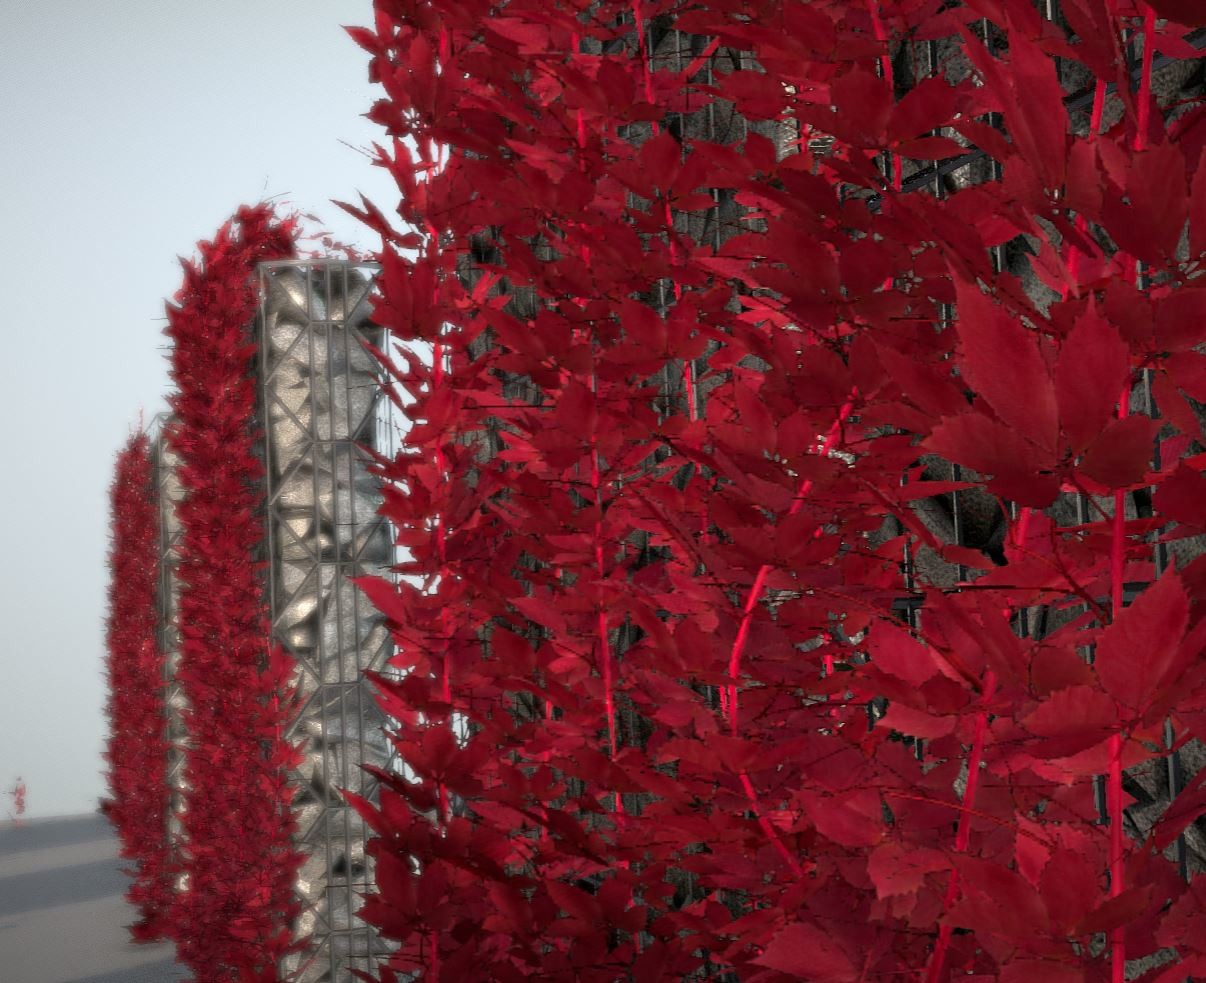 Vine in autumn on gabion walls